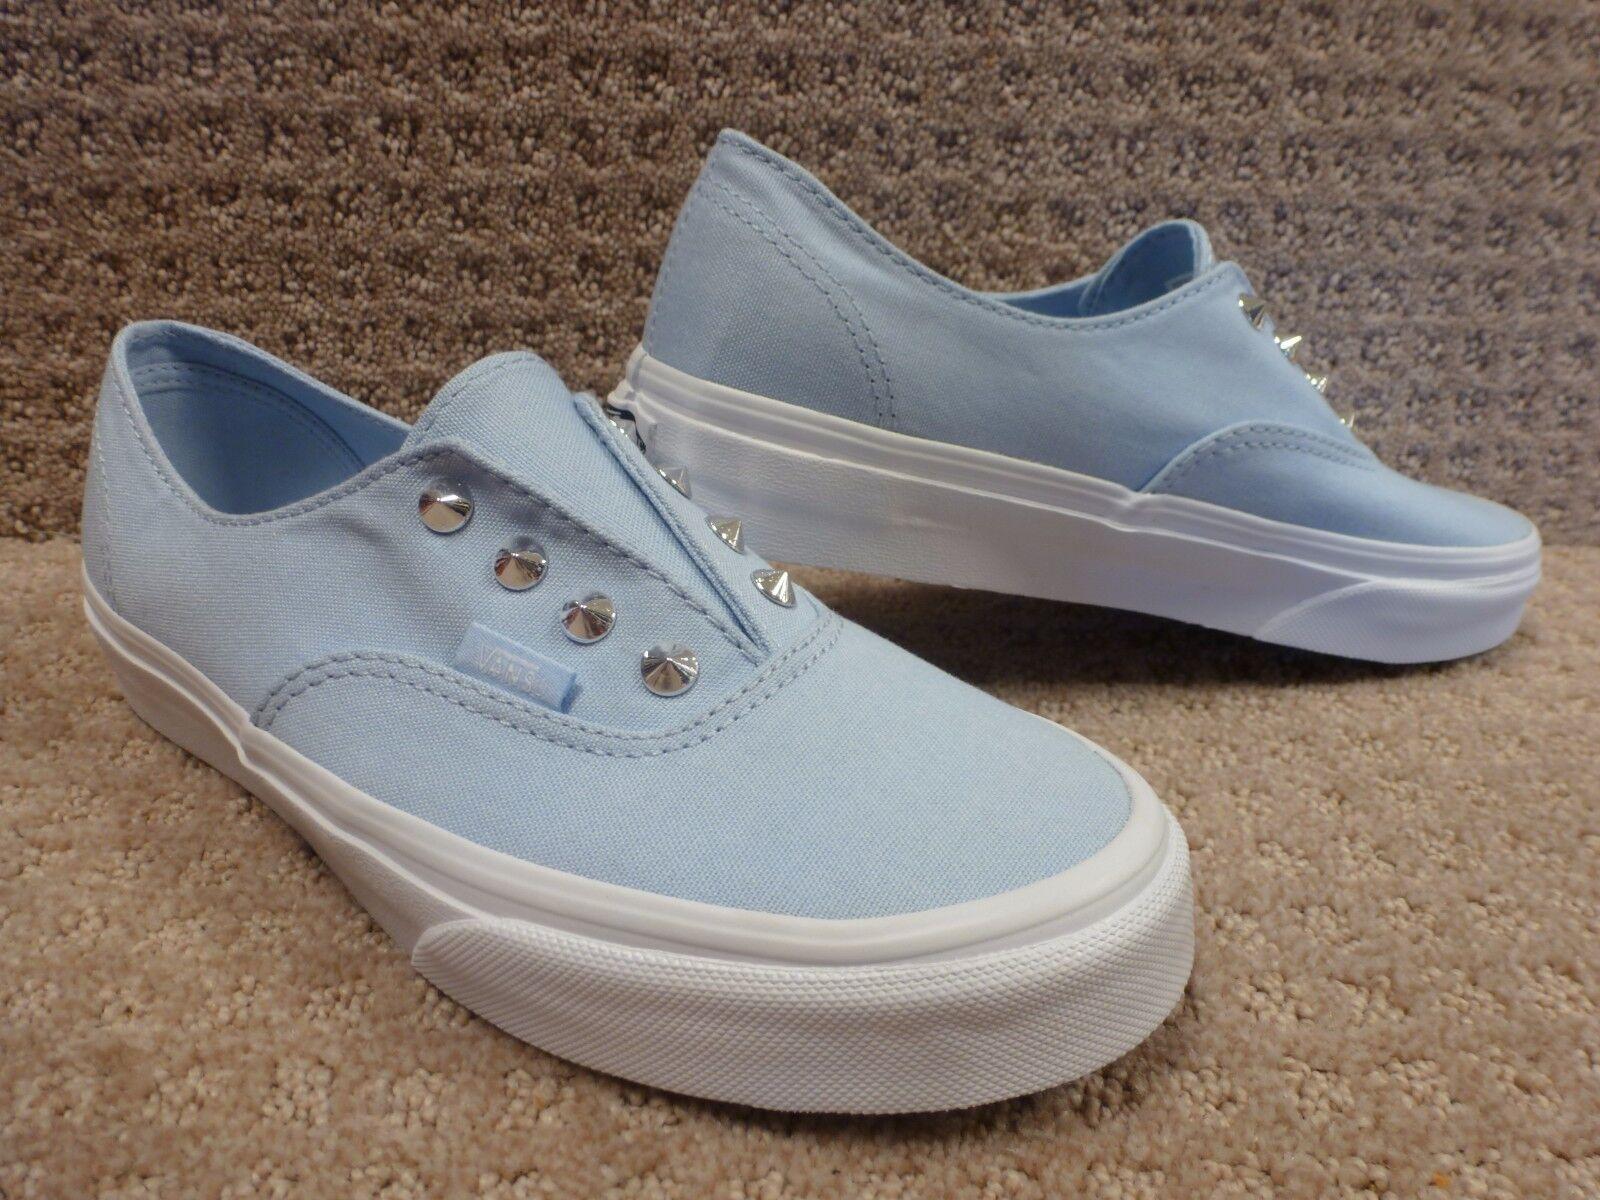 Vans Men's Shoes